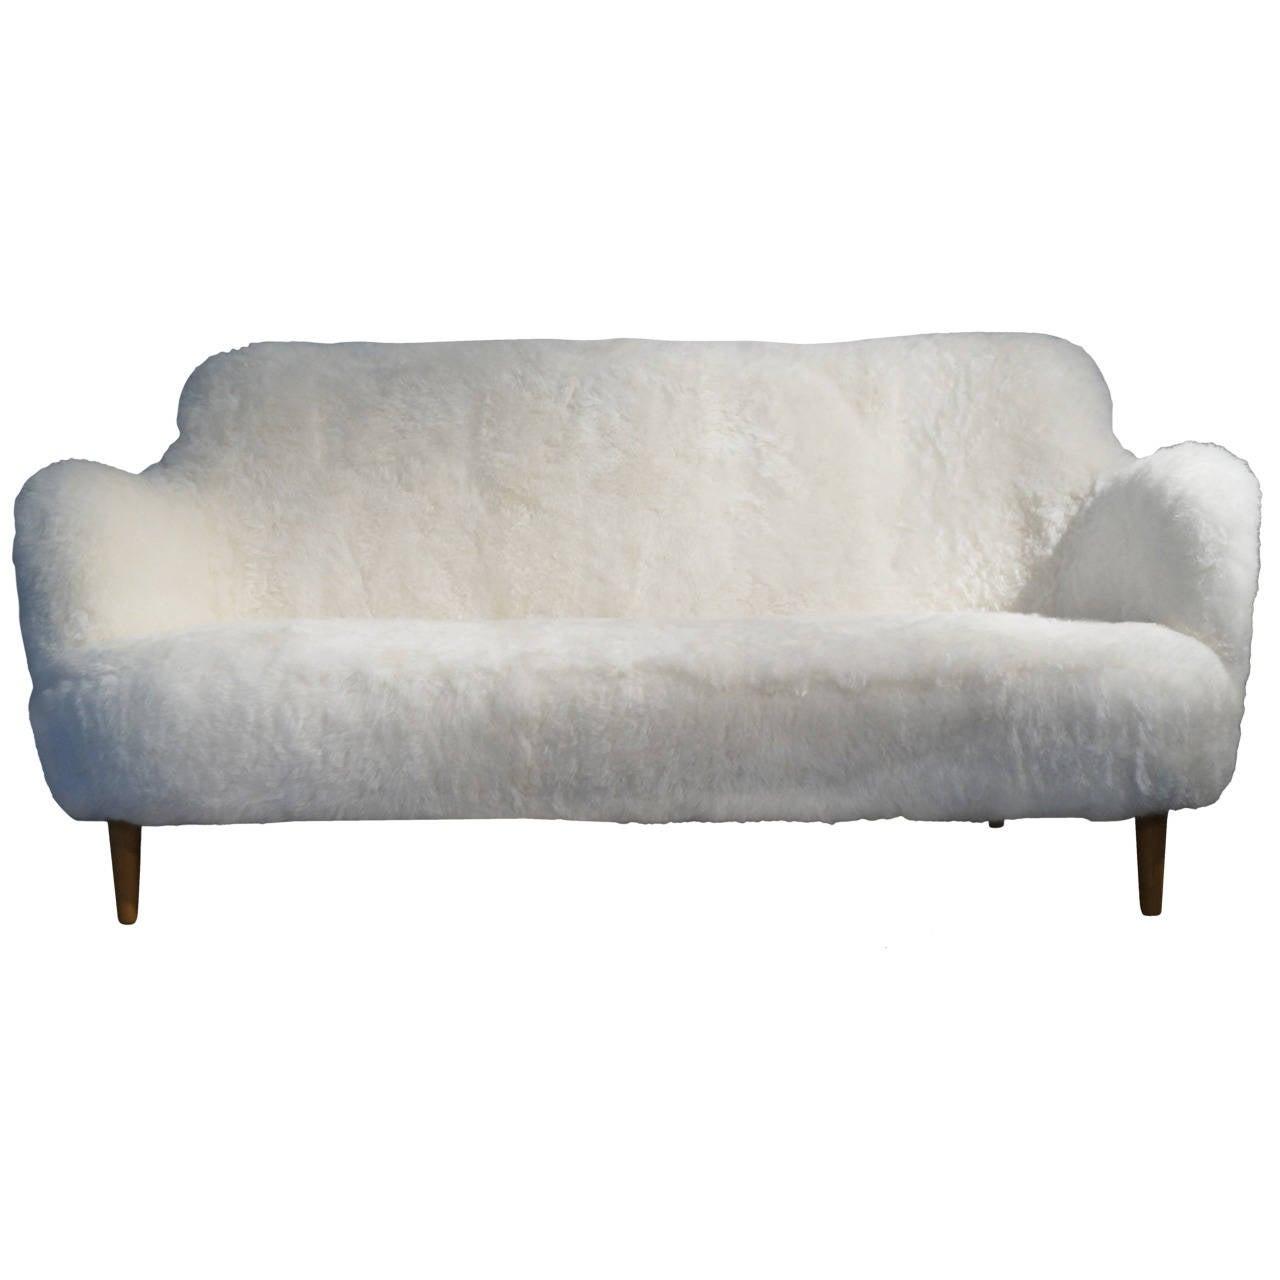 Carl malmsten samsas sofa at 1stdibs Carl malmsten sofa